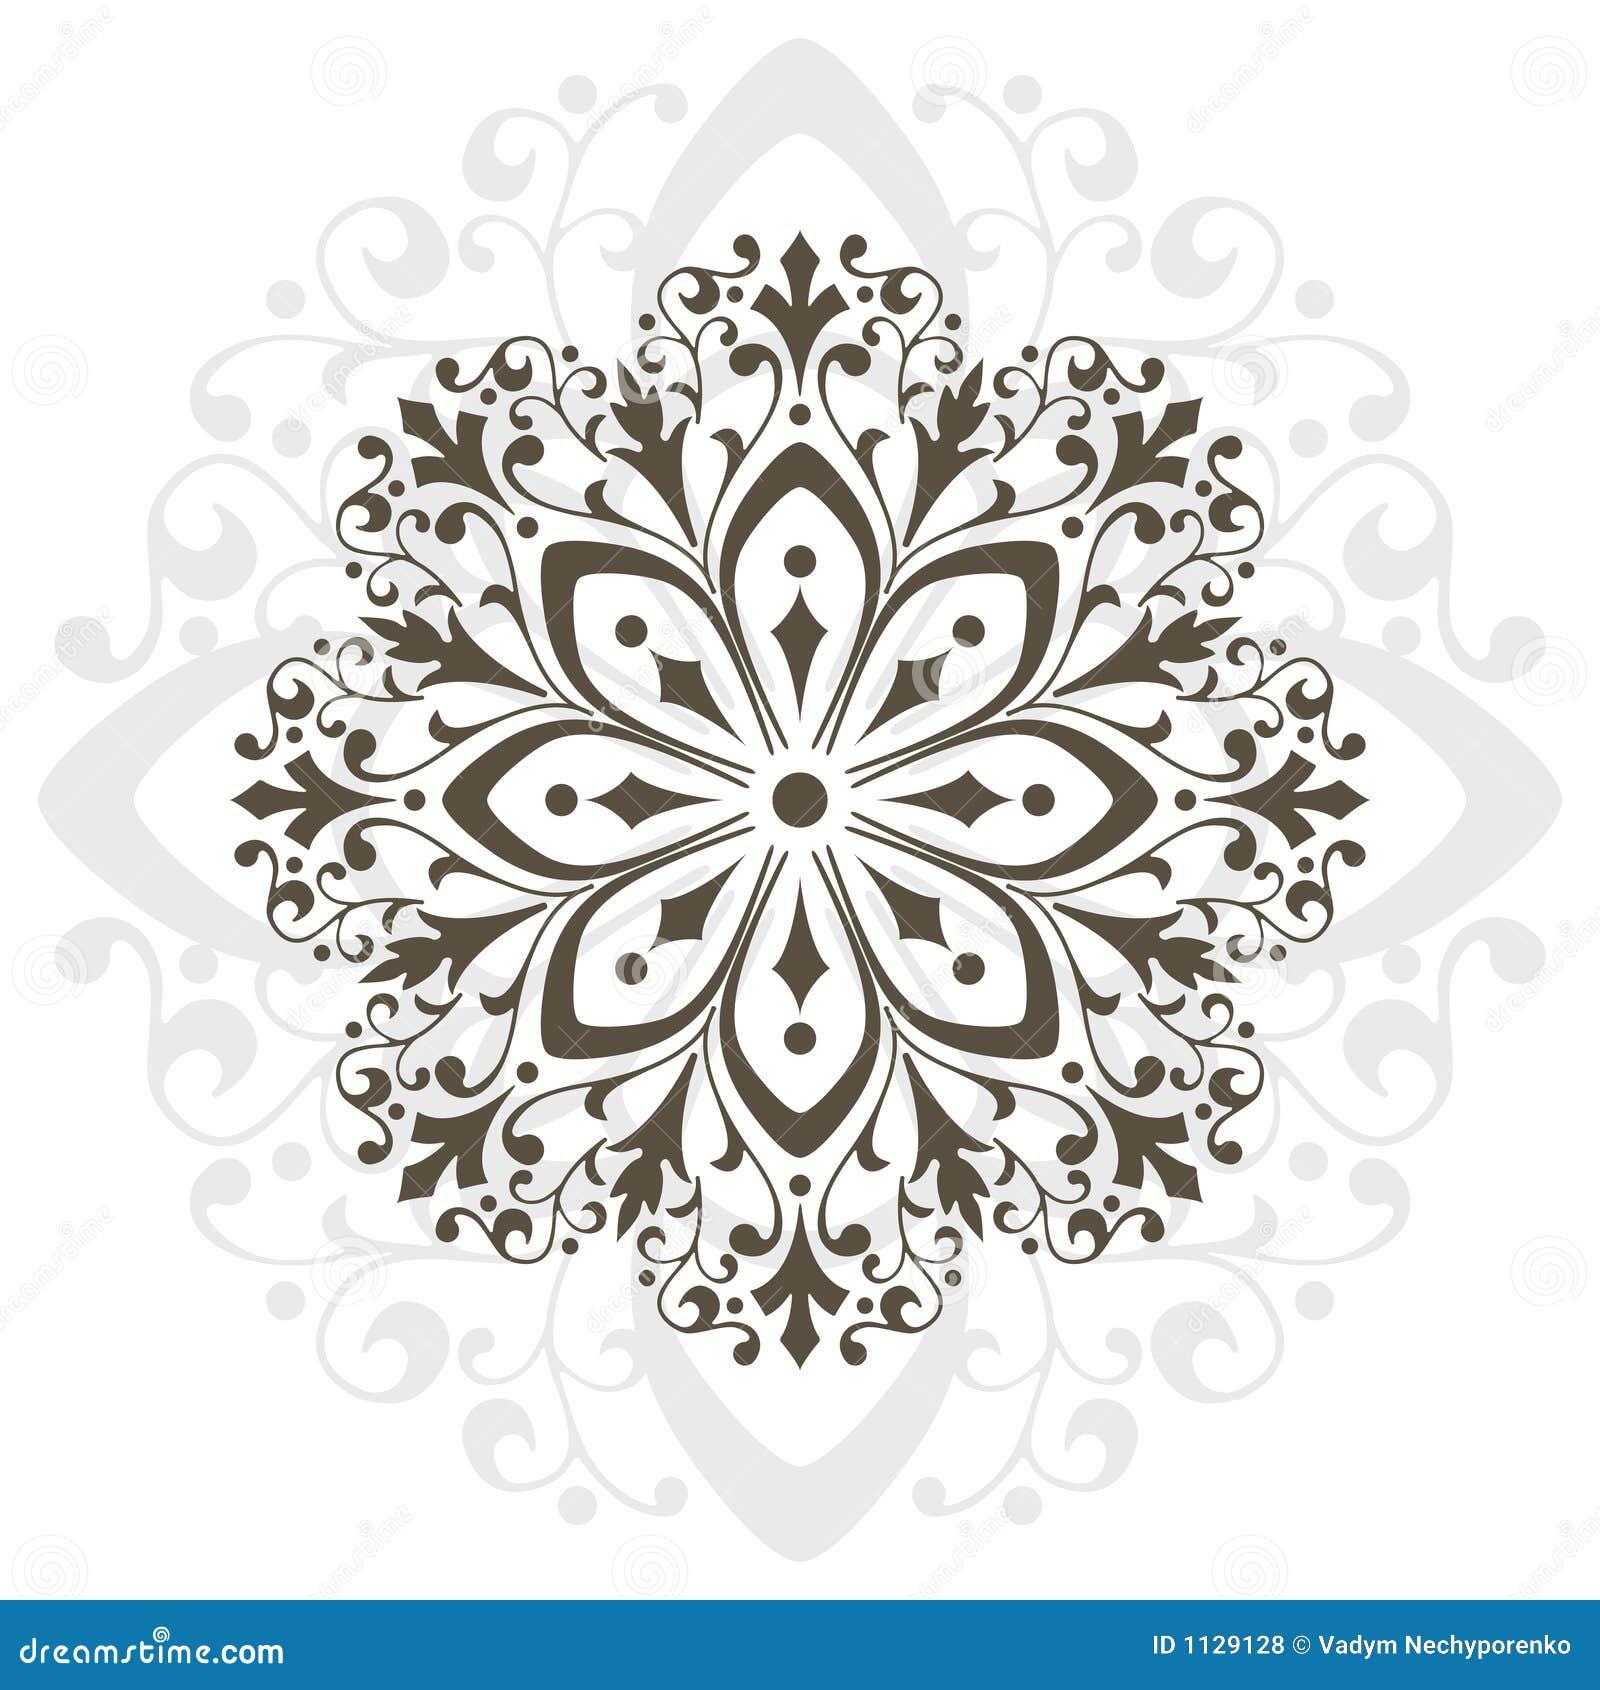 Galleries Related: Modern Islamic Pattern , Geometric Islamic Patterns ...